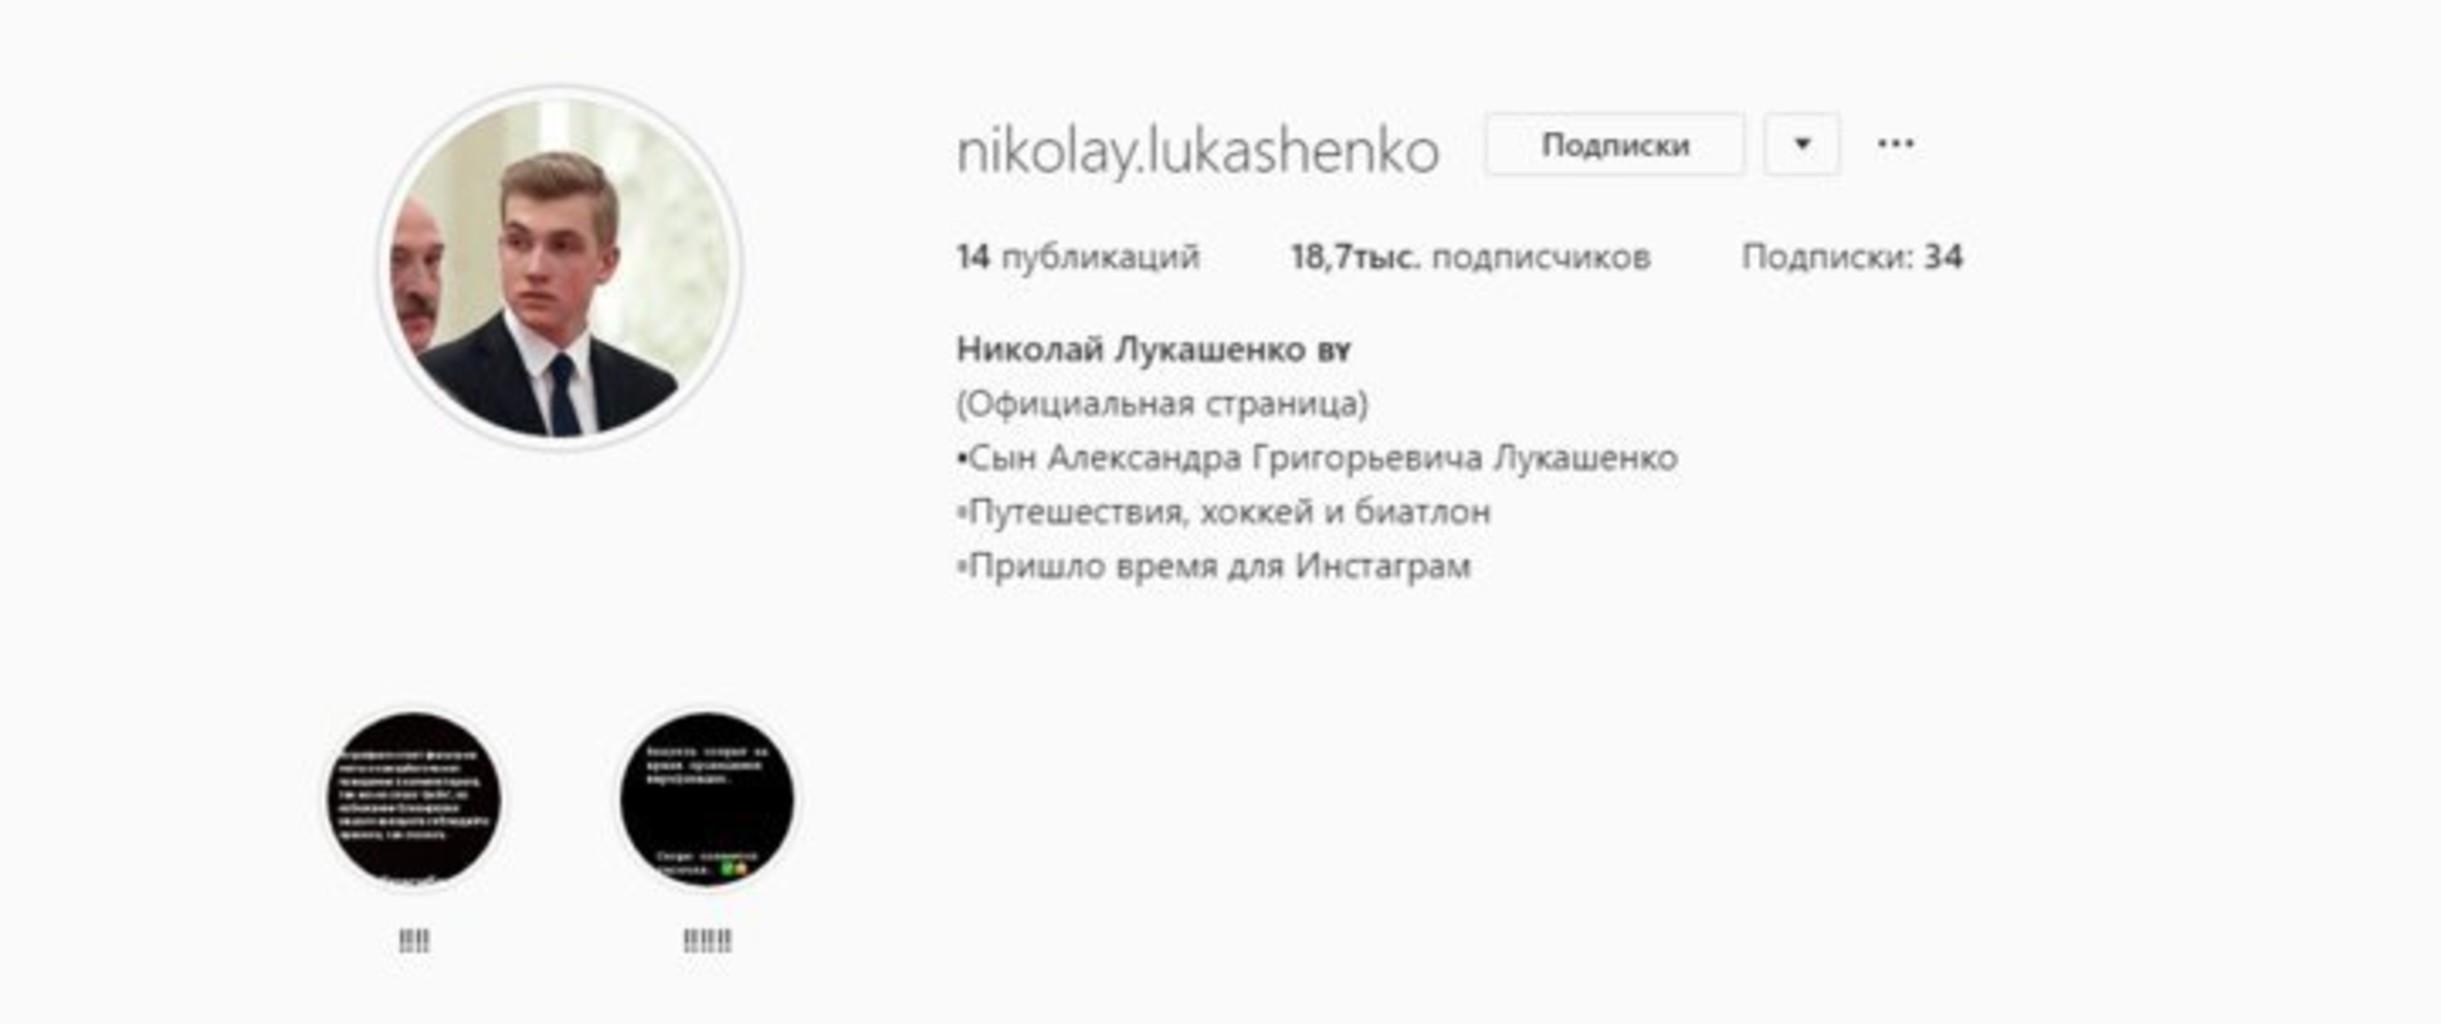 Instagram nikolaya lukashenko 1